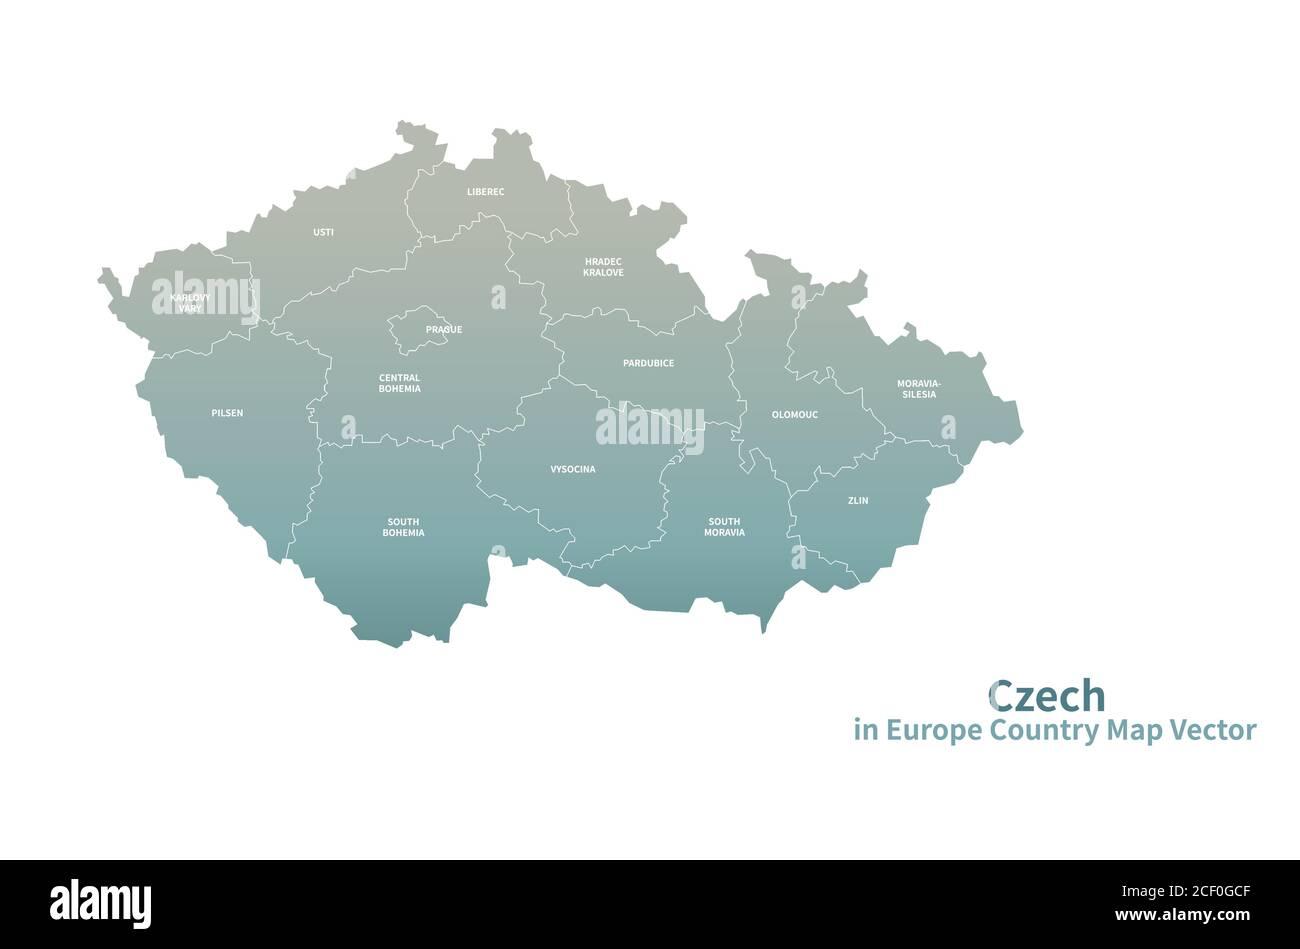 Czechia Vector Map European Country Map Green Series Stock Vector Image Art Alamy